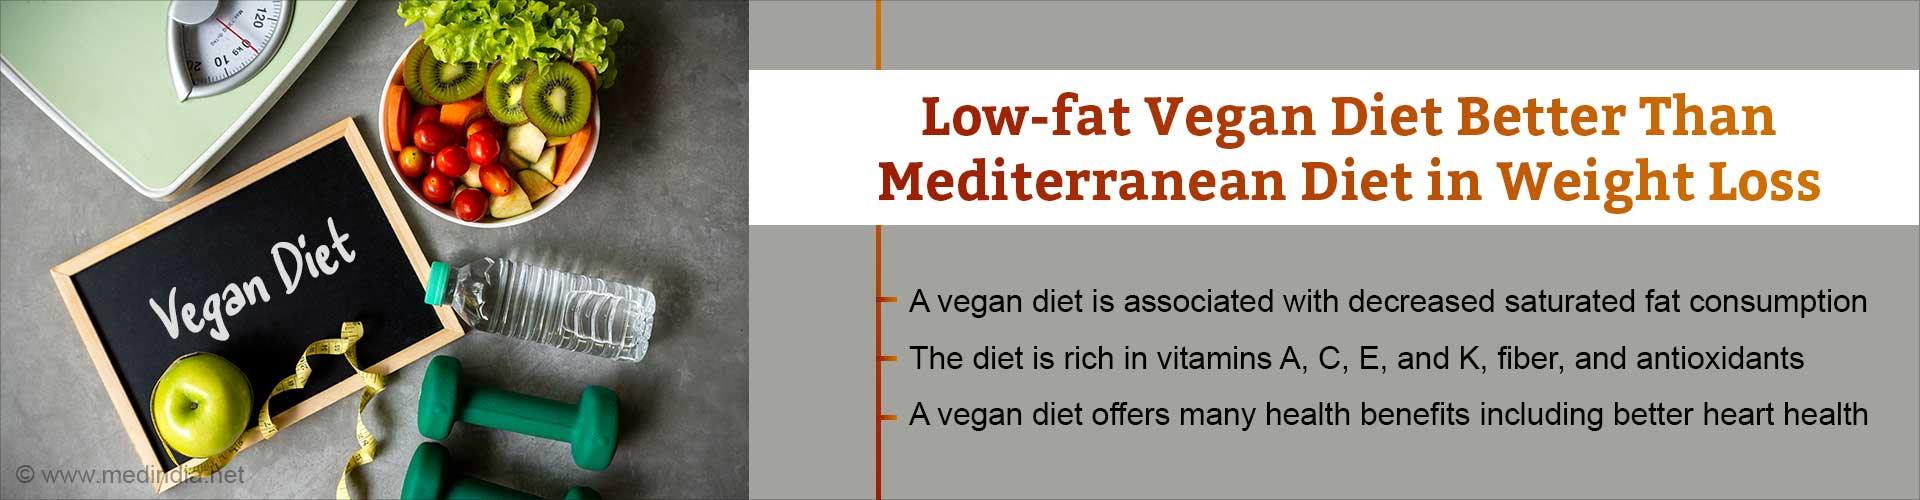 Vegan Diet - Better Choice for Weight Loss Than Mediterranean Diet